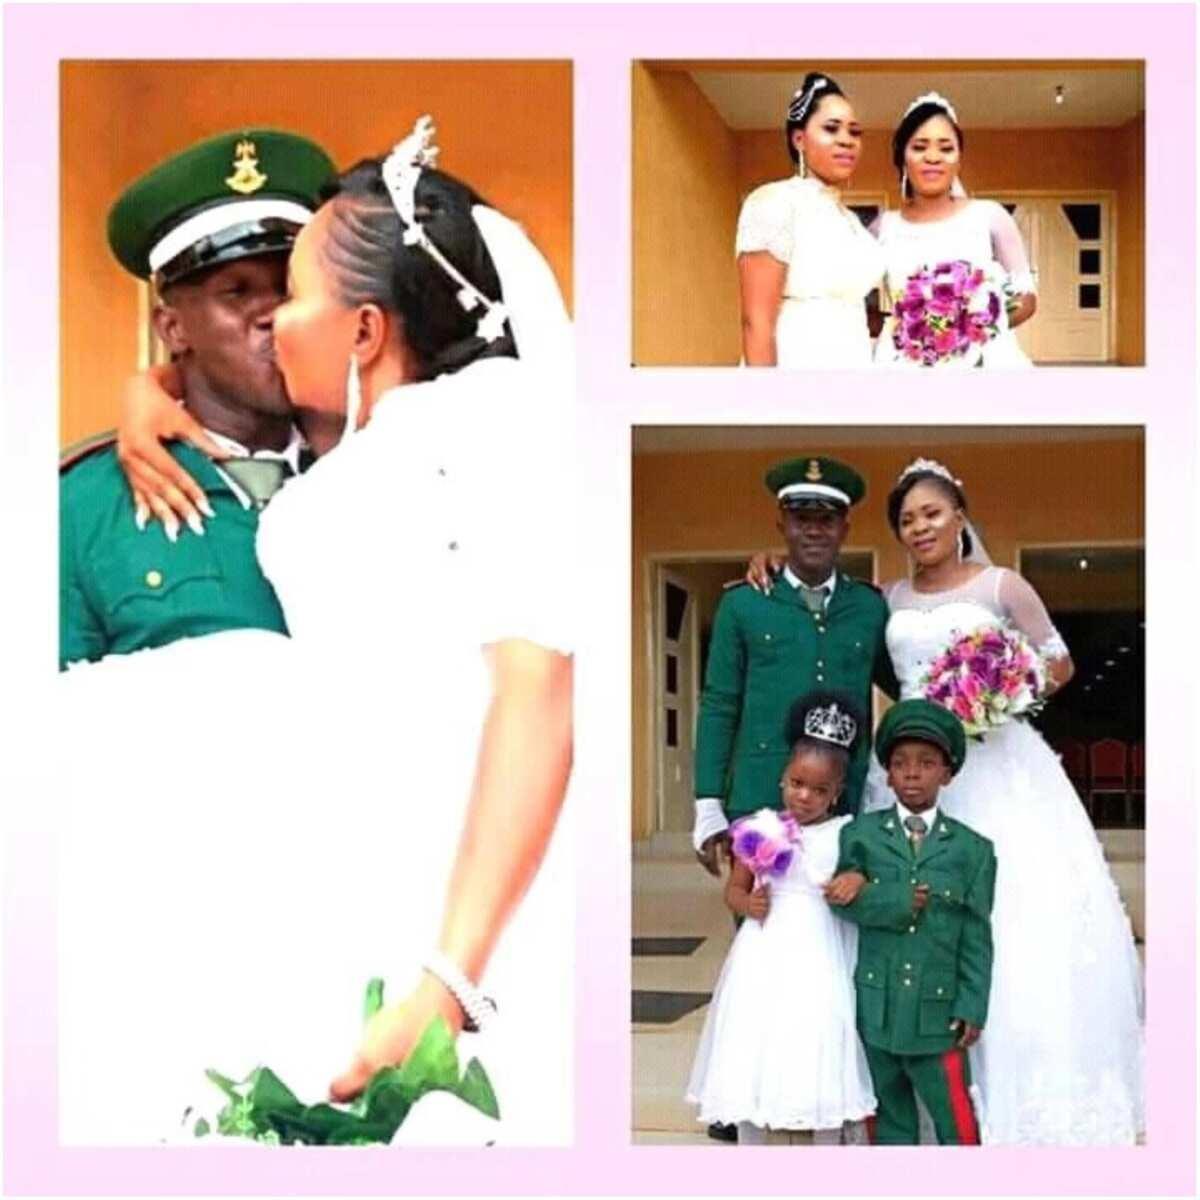 Lovely wedding photos